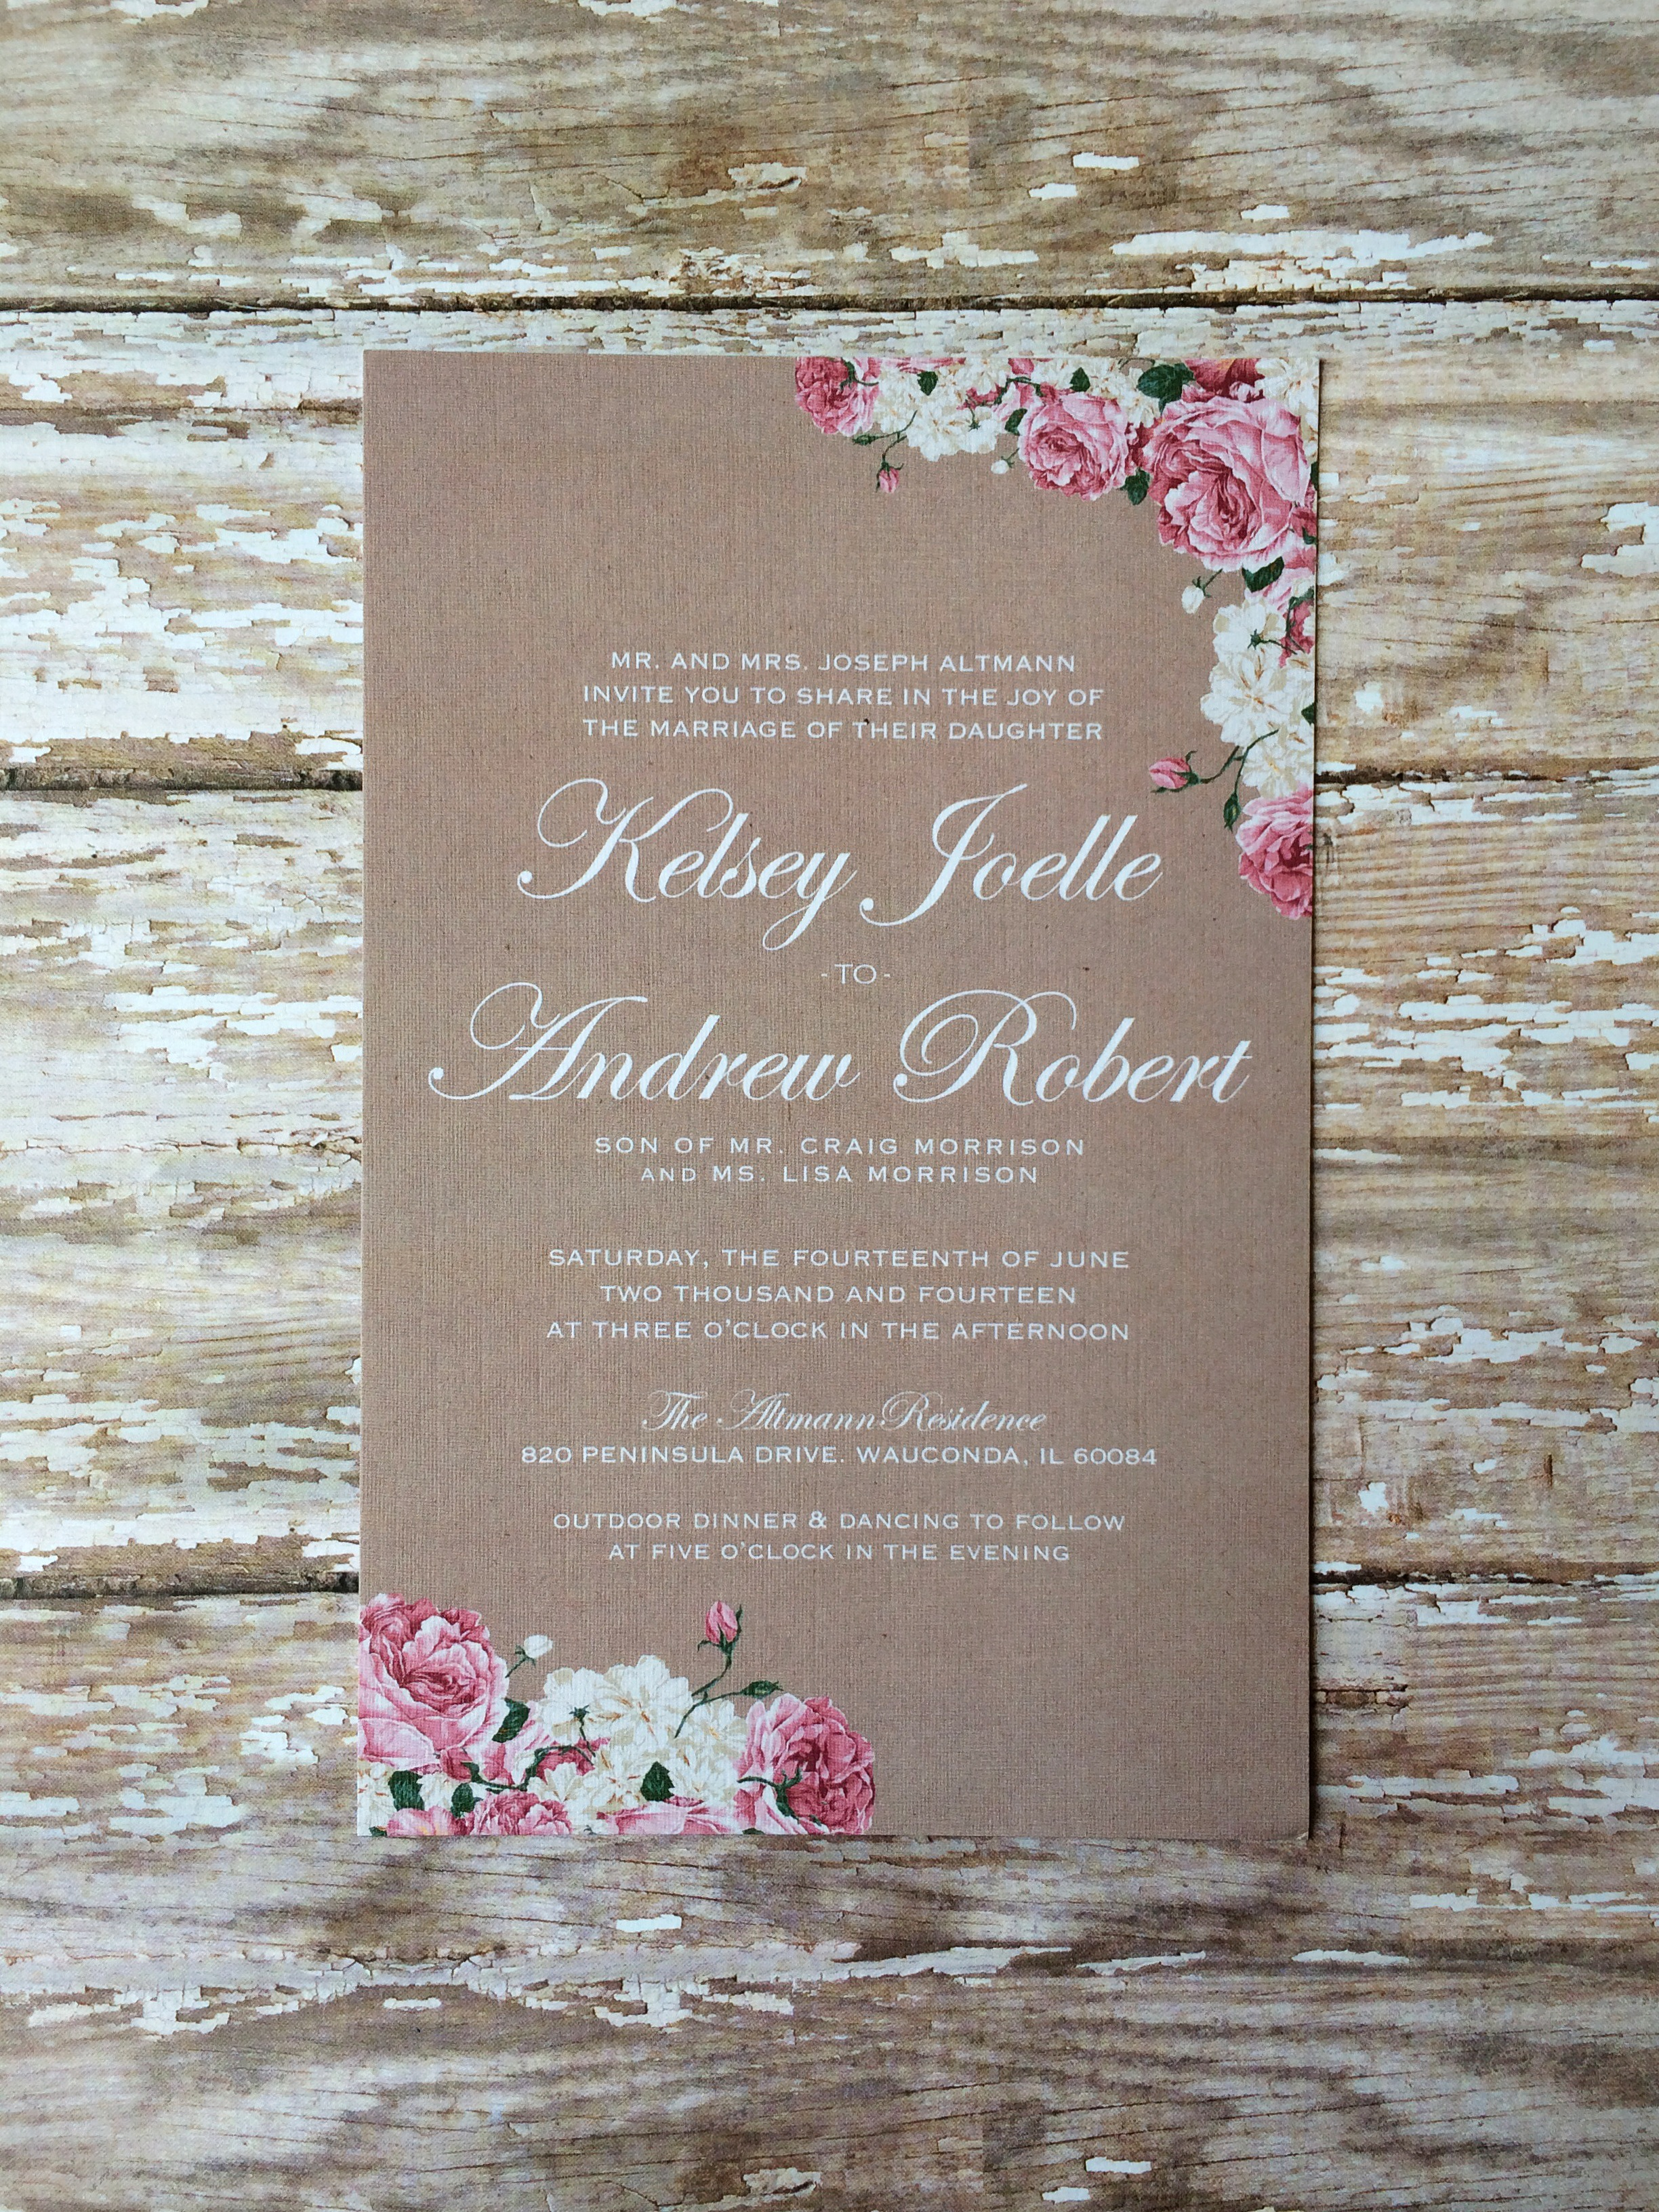 Bsaz Creates_Kelsey and Andrew Wedding Invite